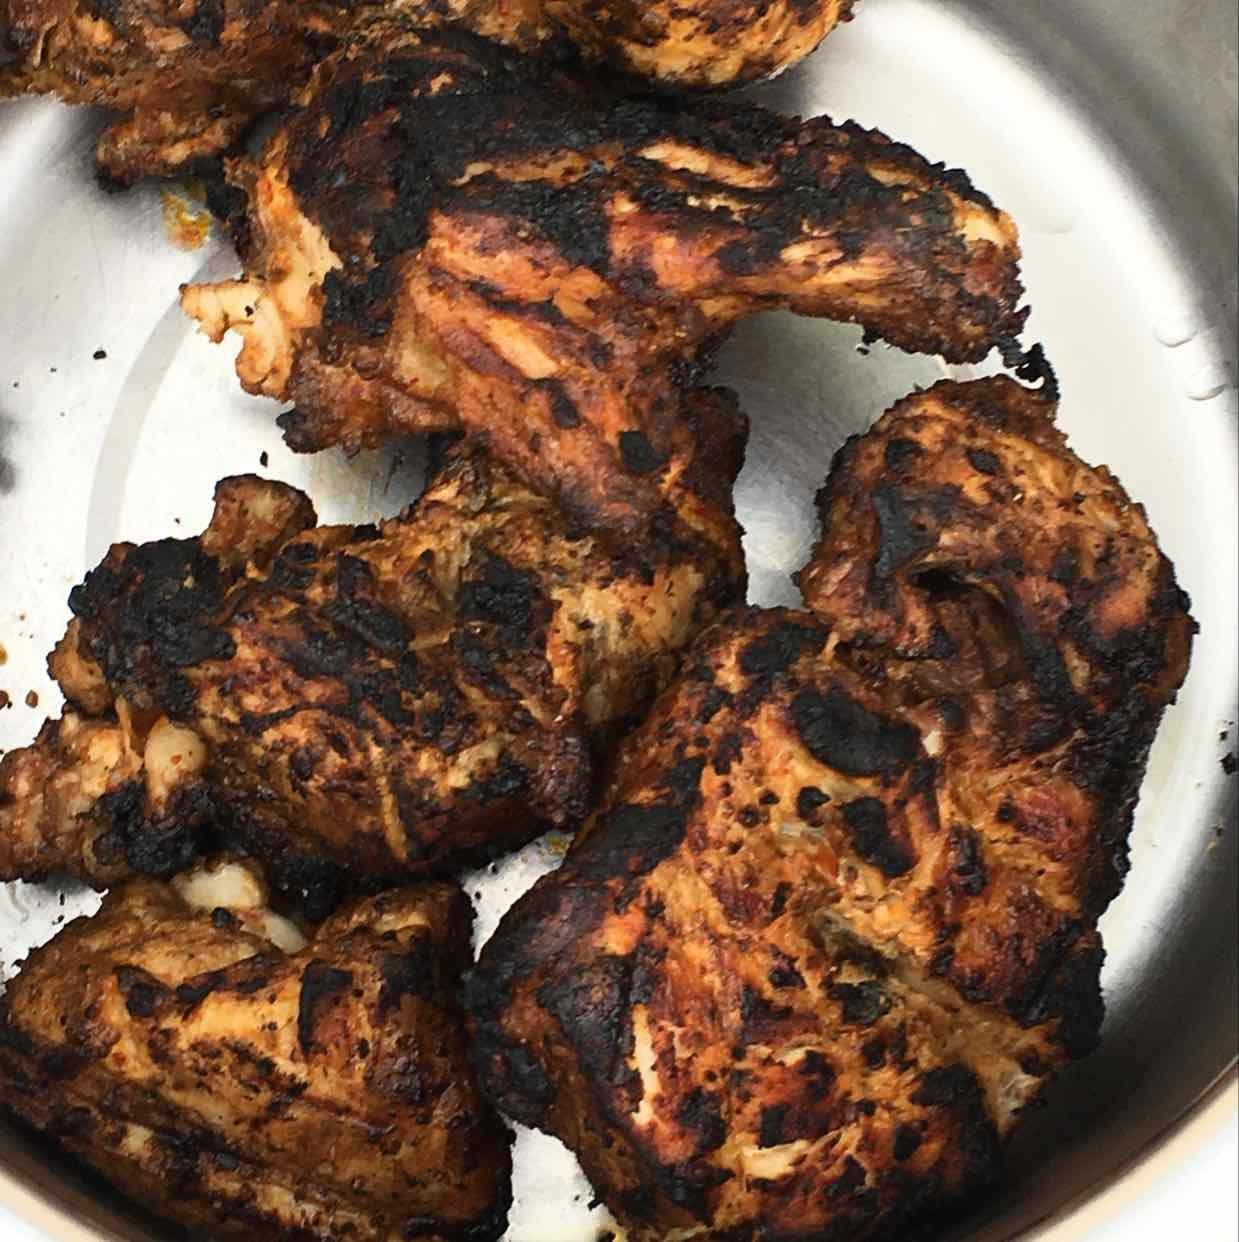 How to make Smokey BBQ chicken